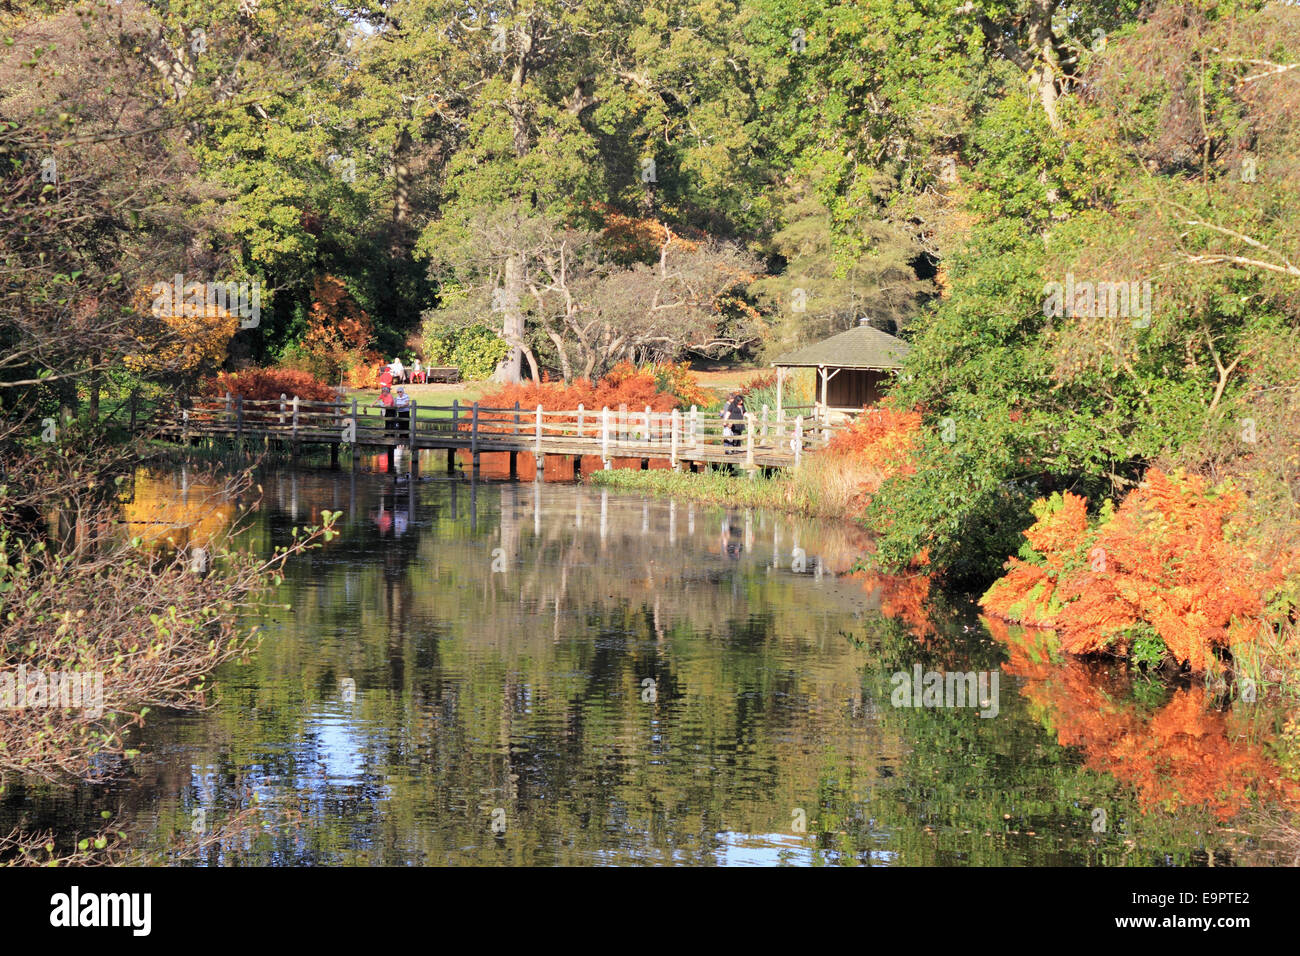 Savill Garden Englefield Green Windsor Berkshire Uk 31st October Stock Photo Royalty Free